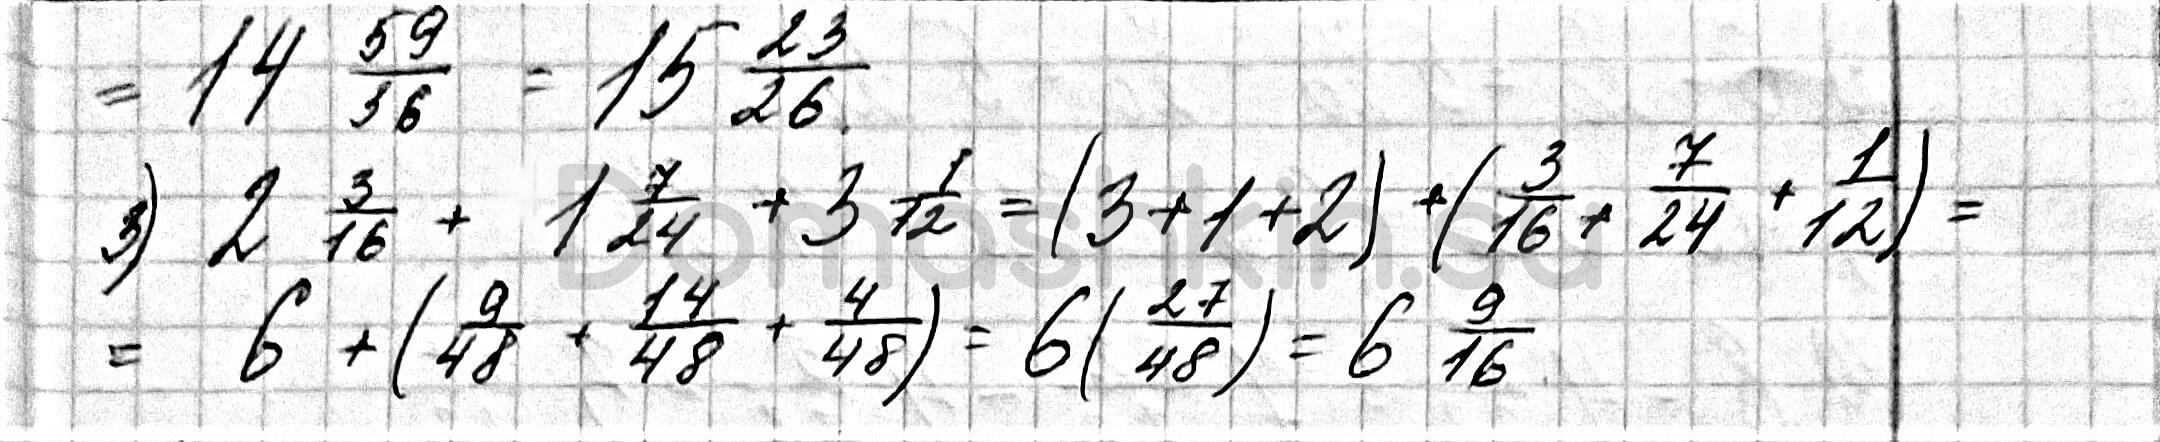 Математика 6 класс учебник Мерзляк номер 275 решение